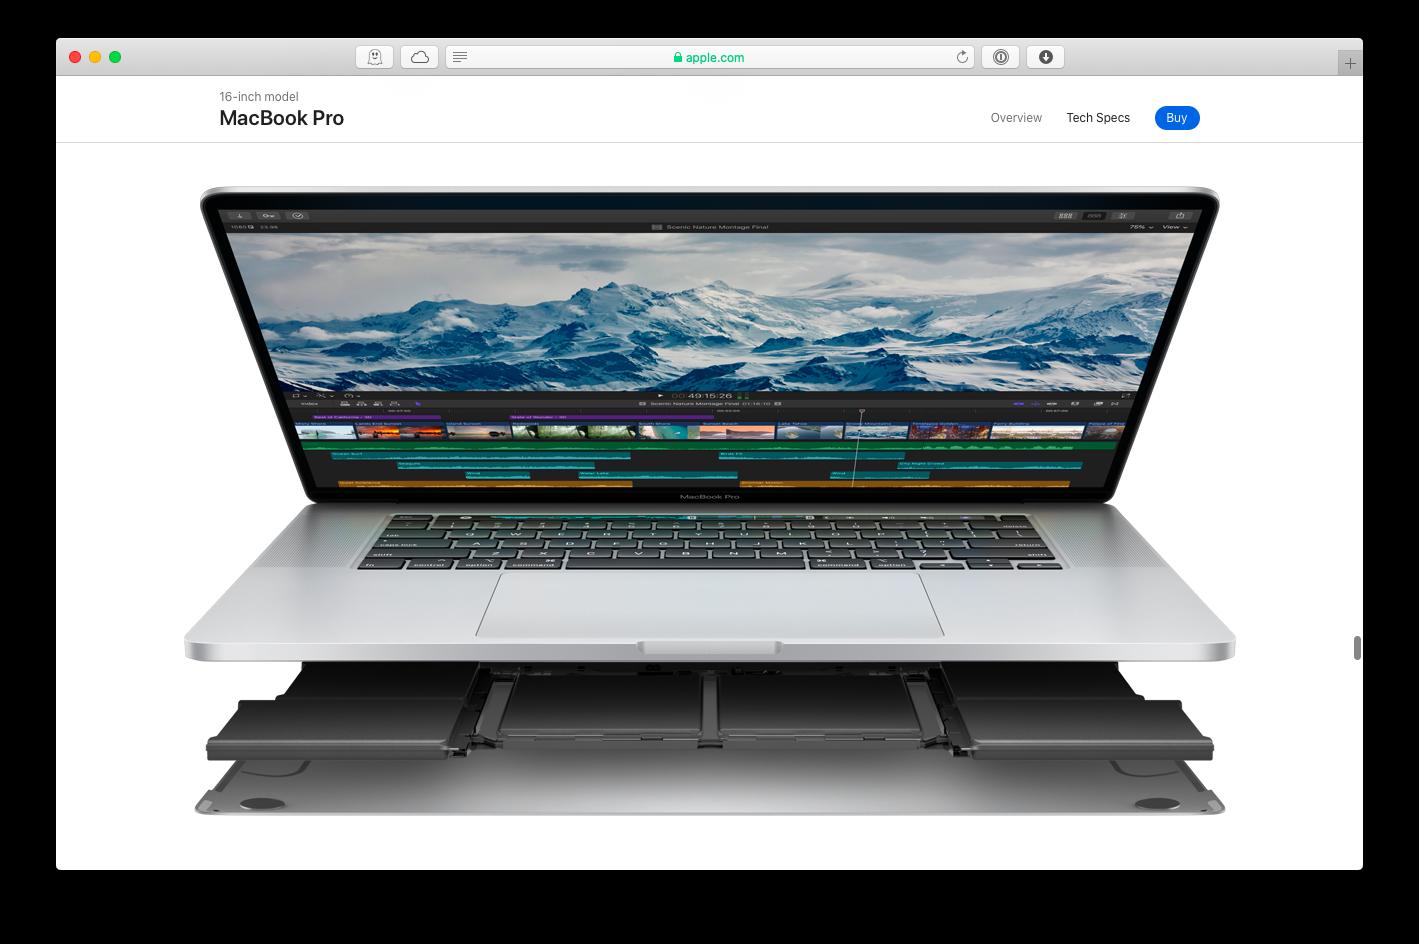 Apple MacBook battery life